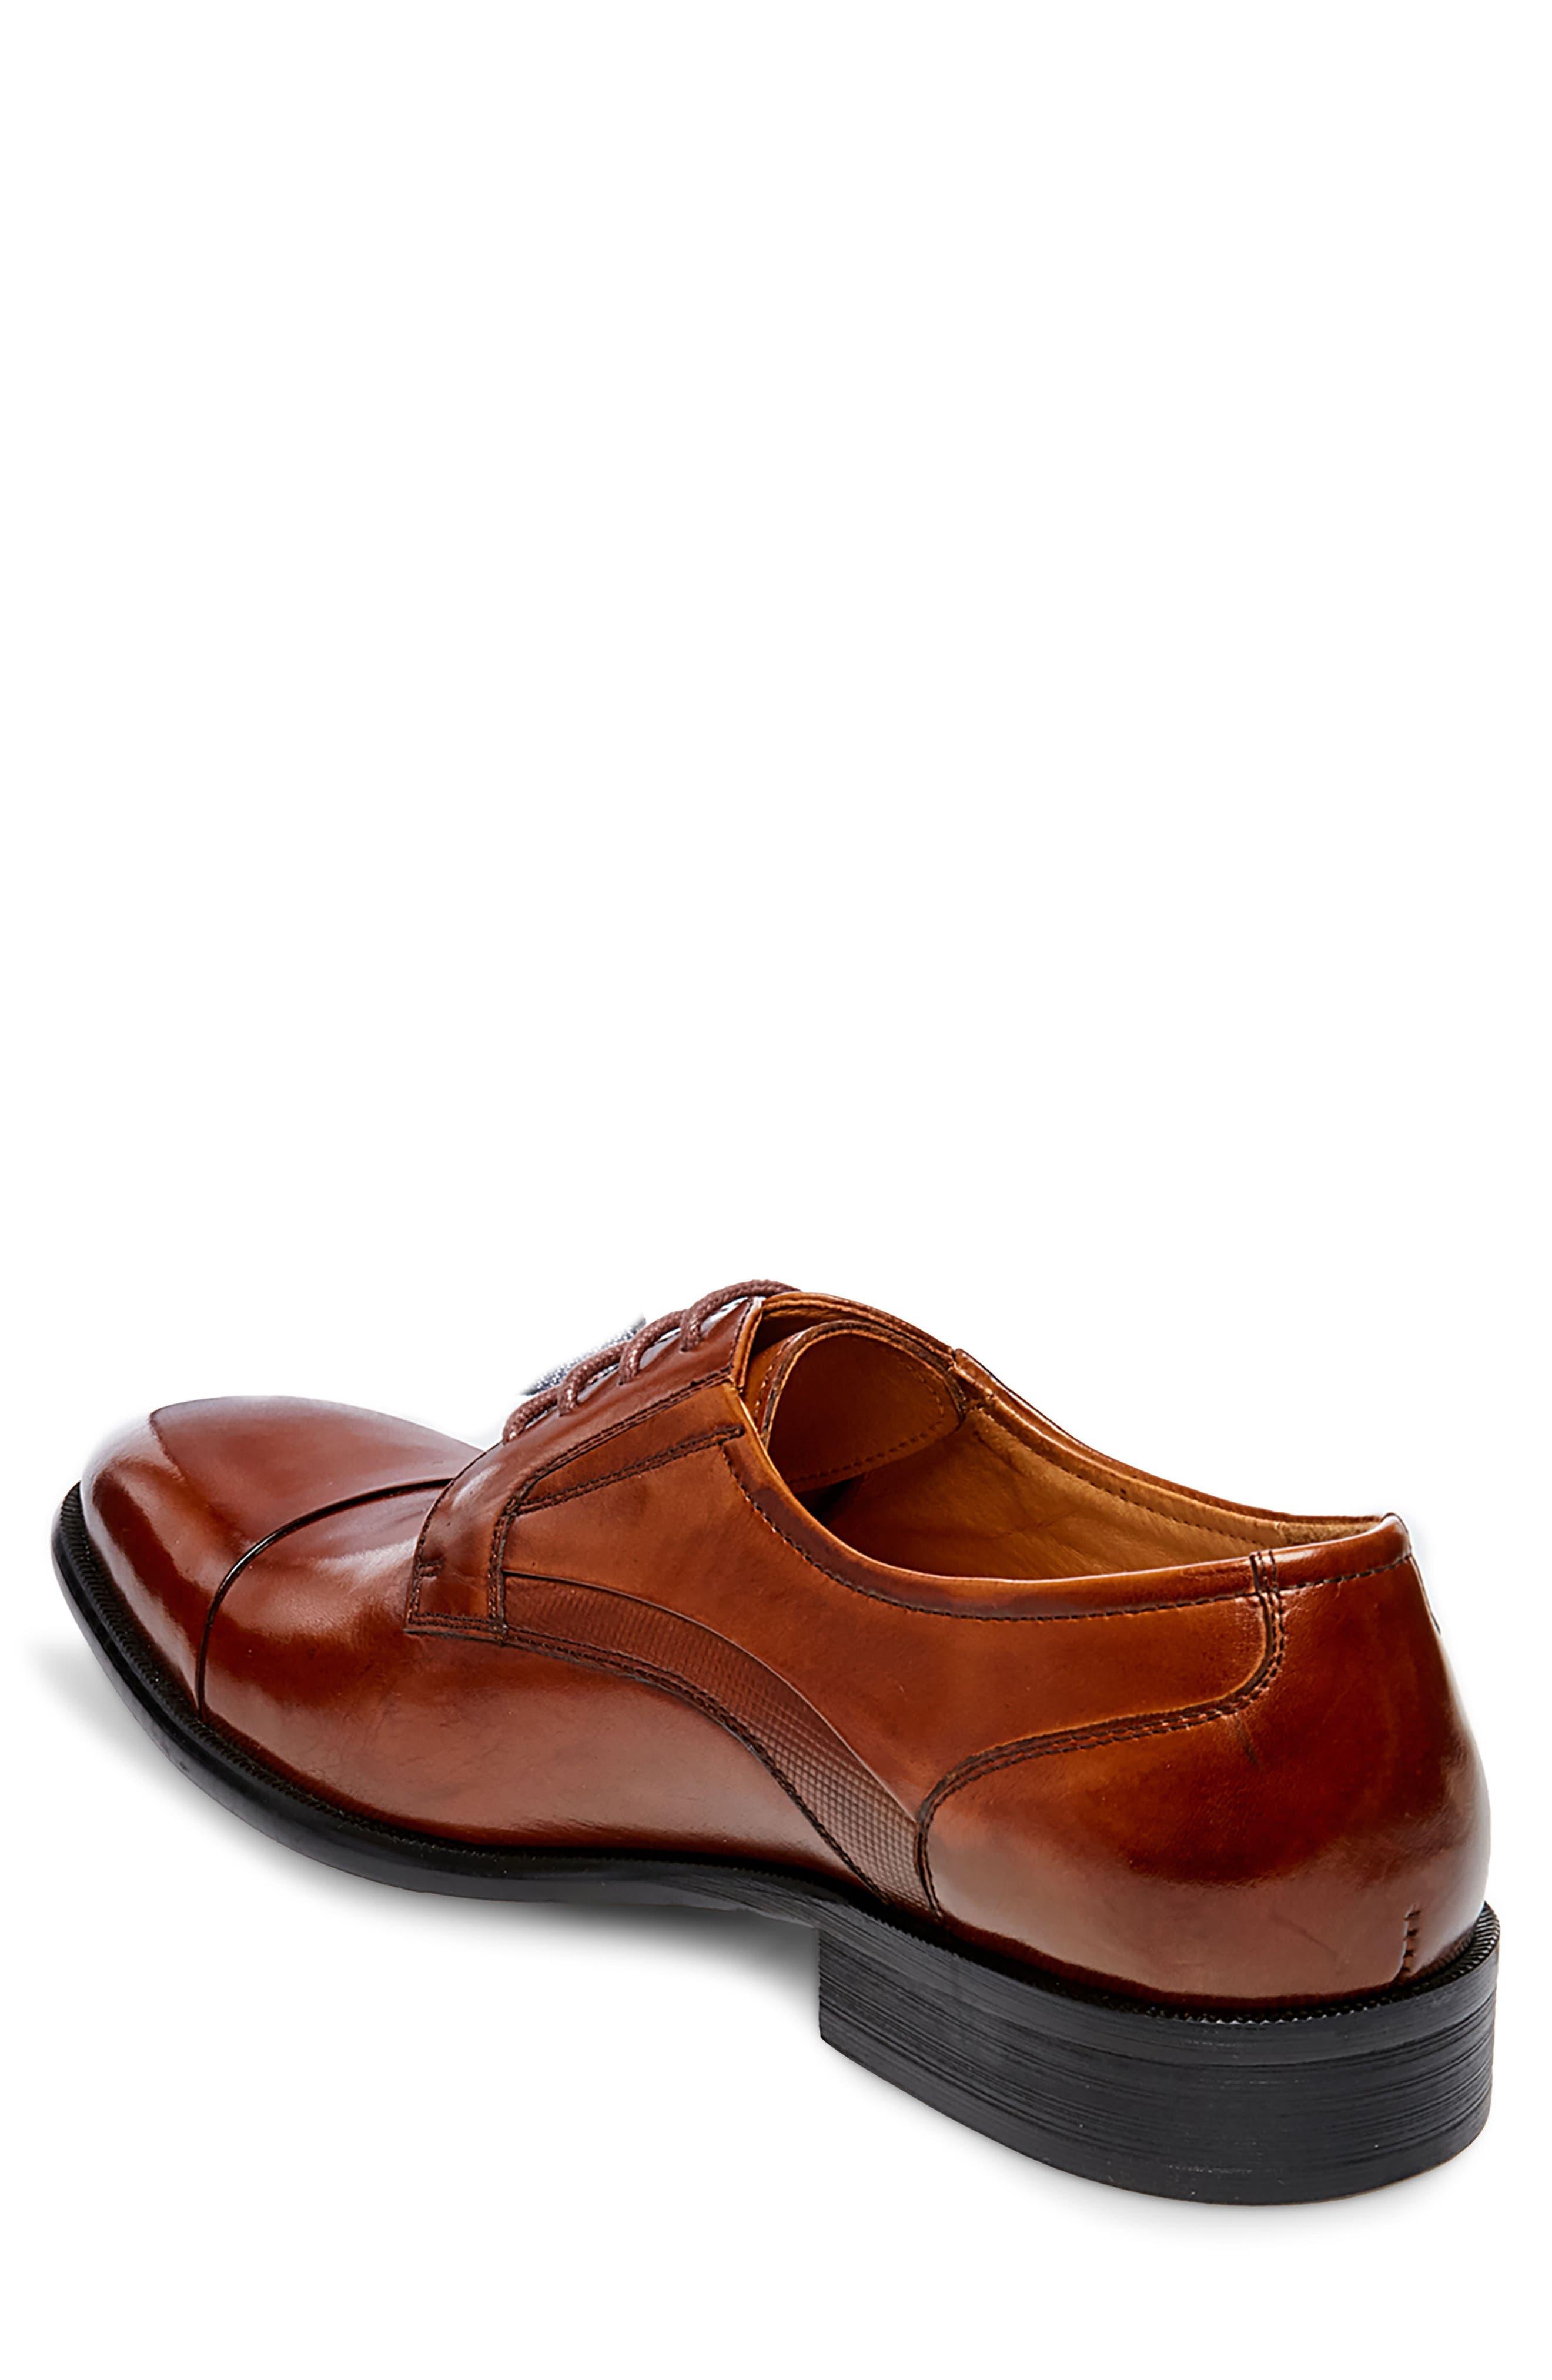 Carlo Cap Toe Derby,                             Alternate thumbnail 2, color,                             Tan Leather